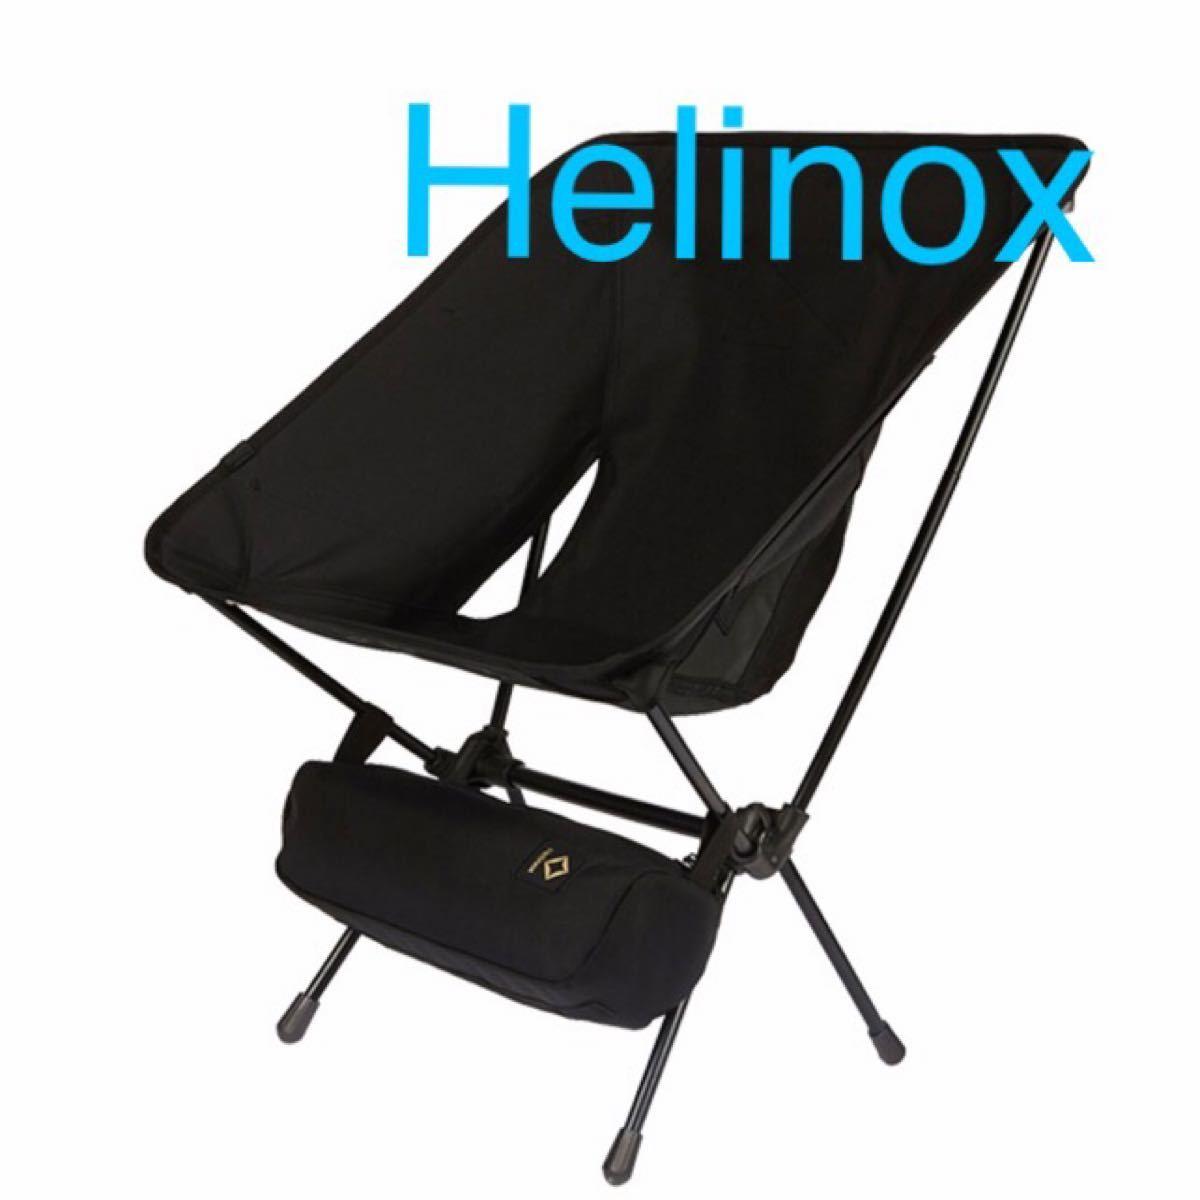 Helinox ヘリノックス タクティカルチェア ブラック 新品未使用品